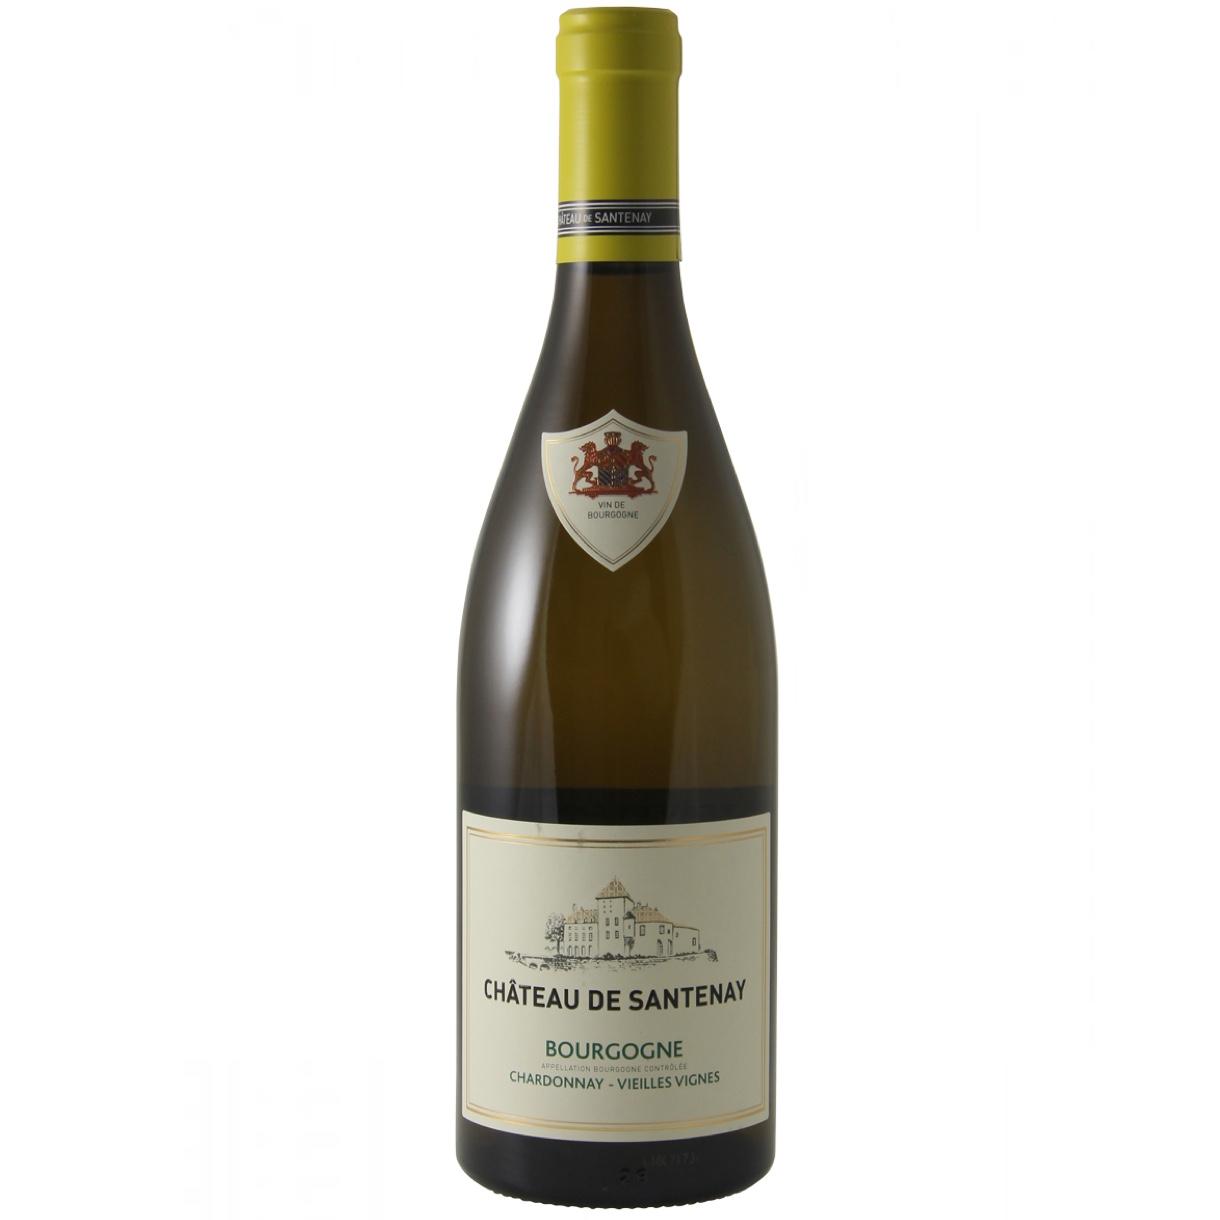 Chateau-de-Santenay-Bourgogne-Chardonnay-Wijnvanons